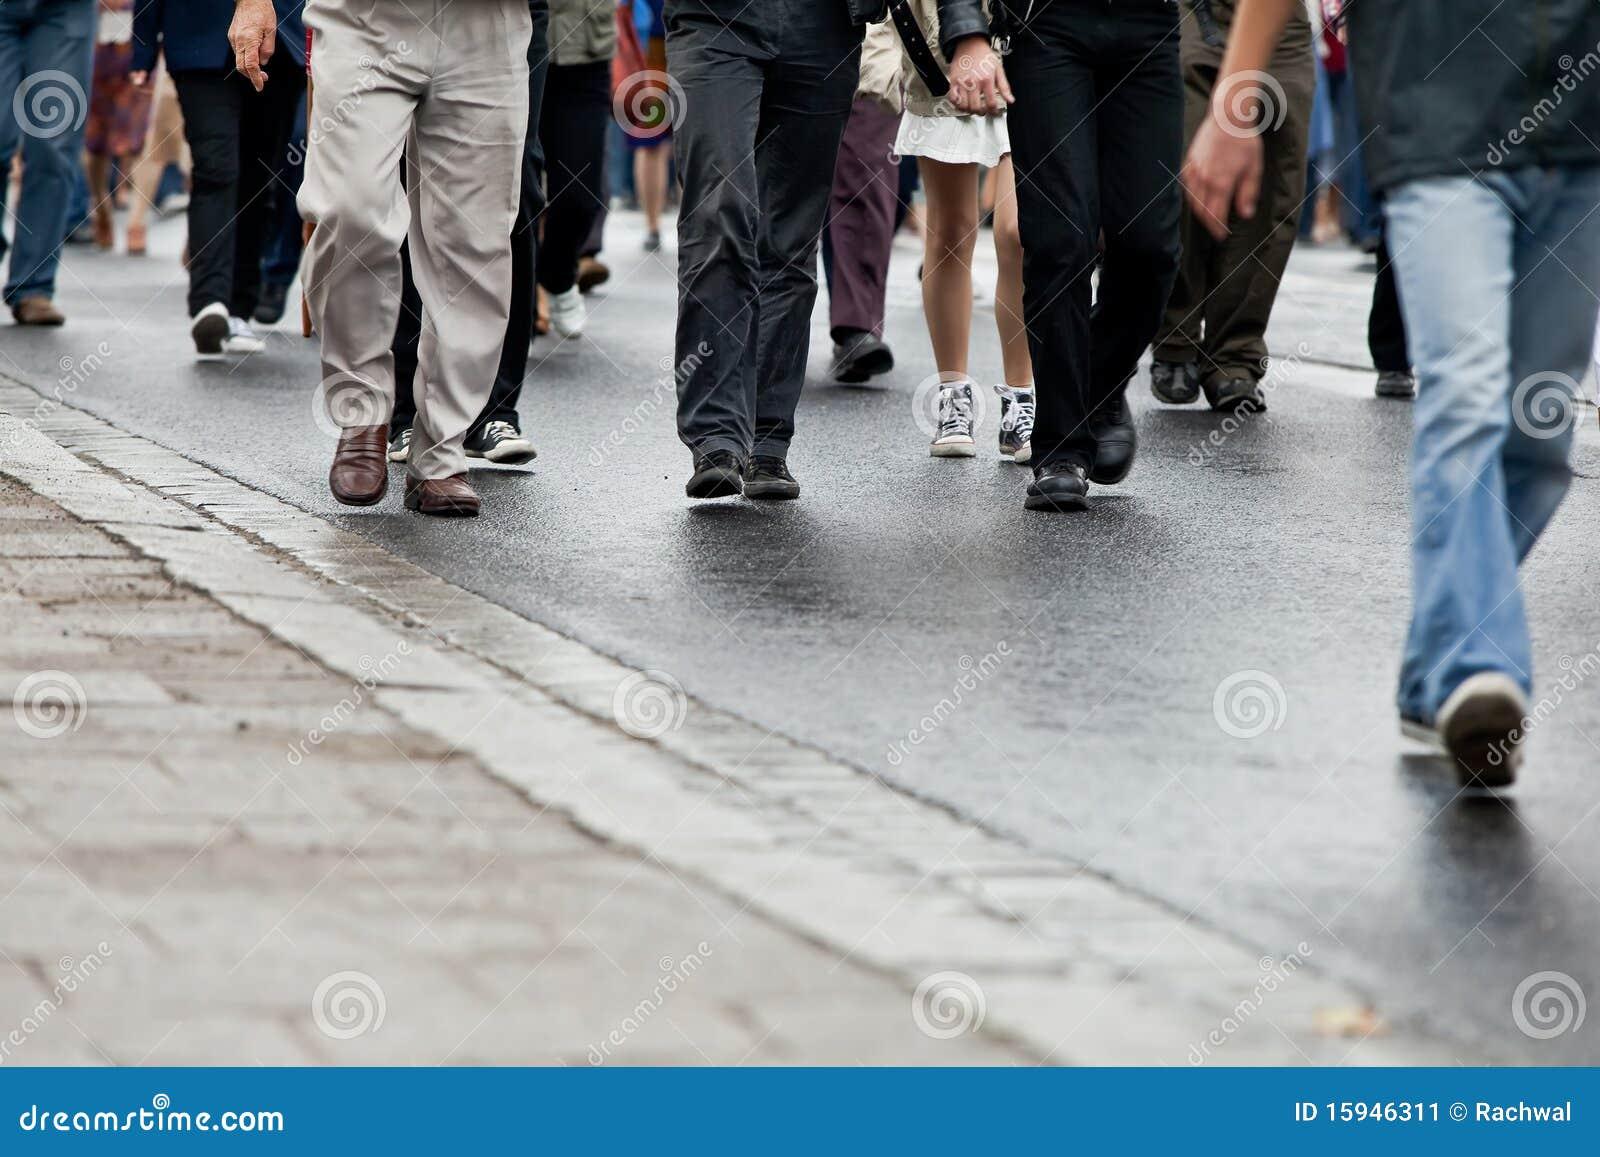 Crowd walking stock image  Image of asphalt, street, walk